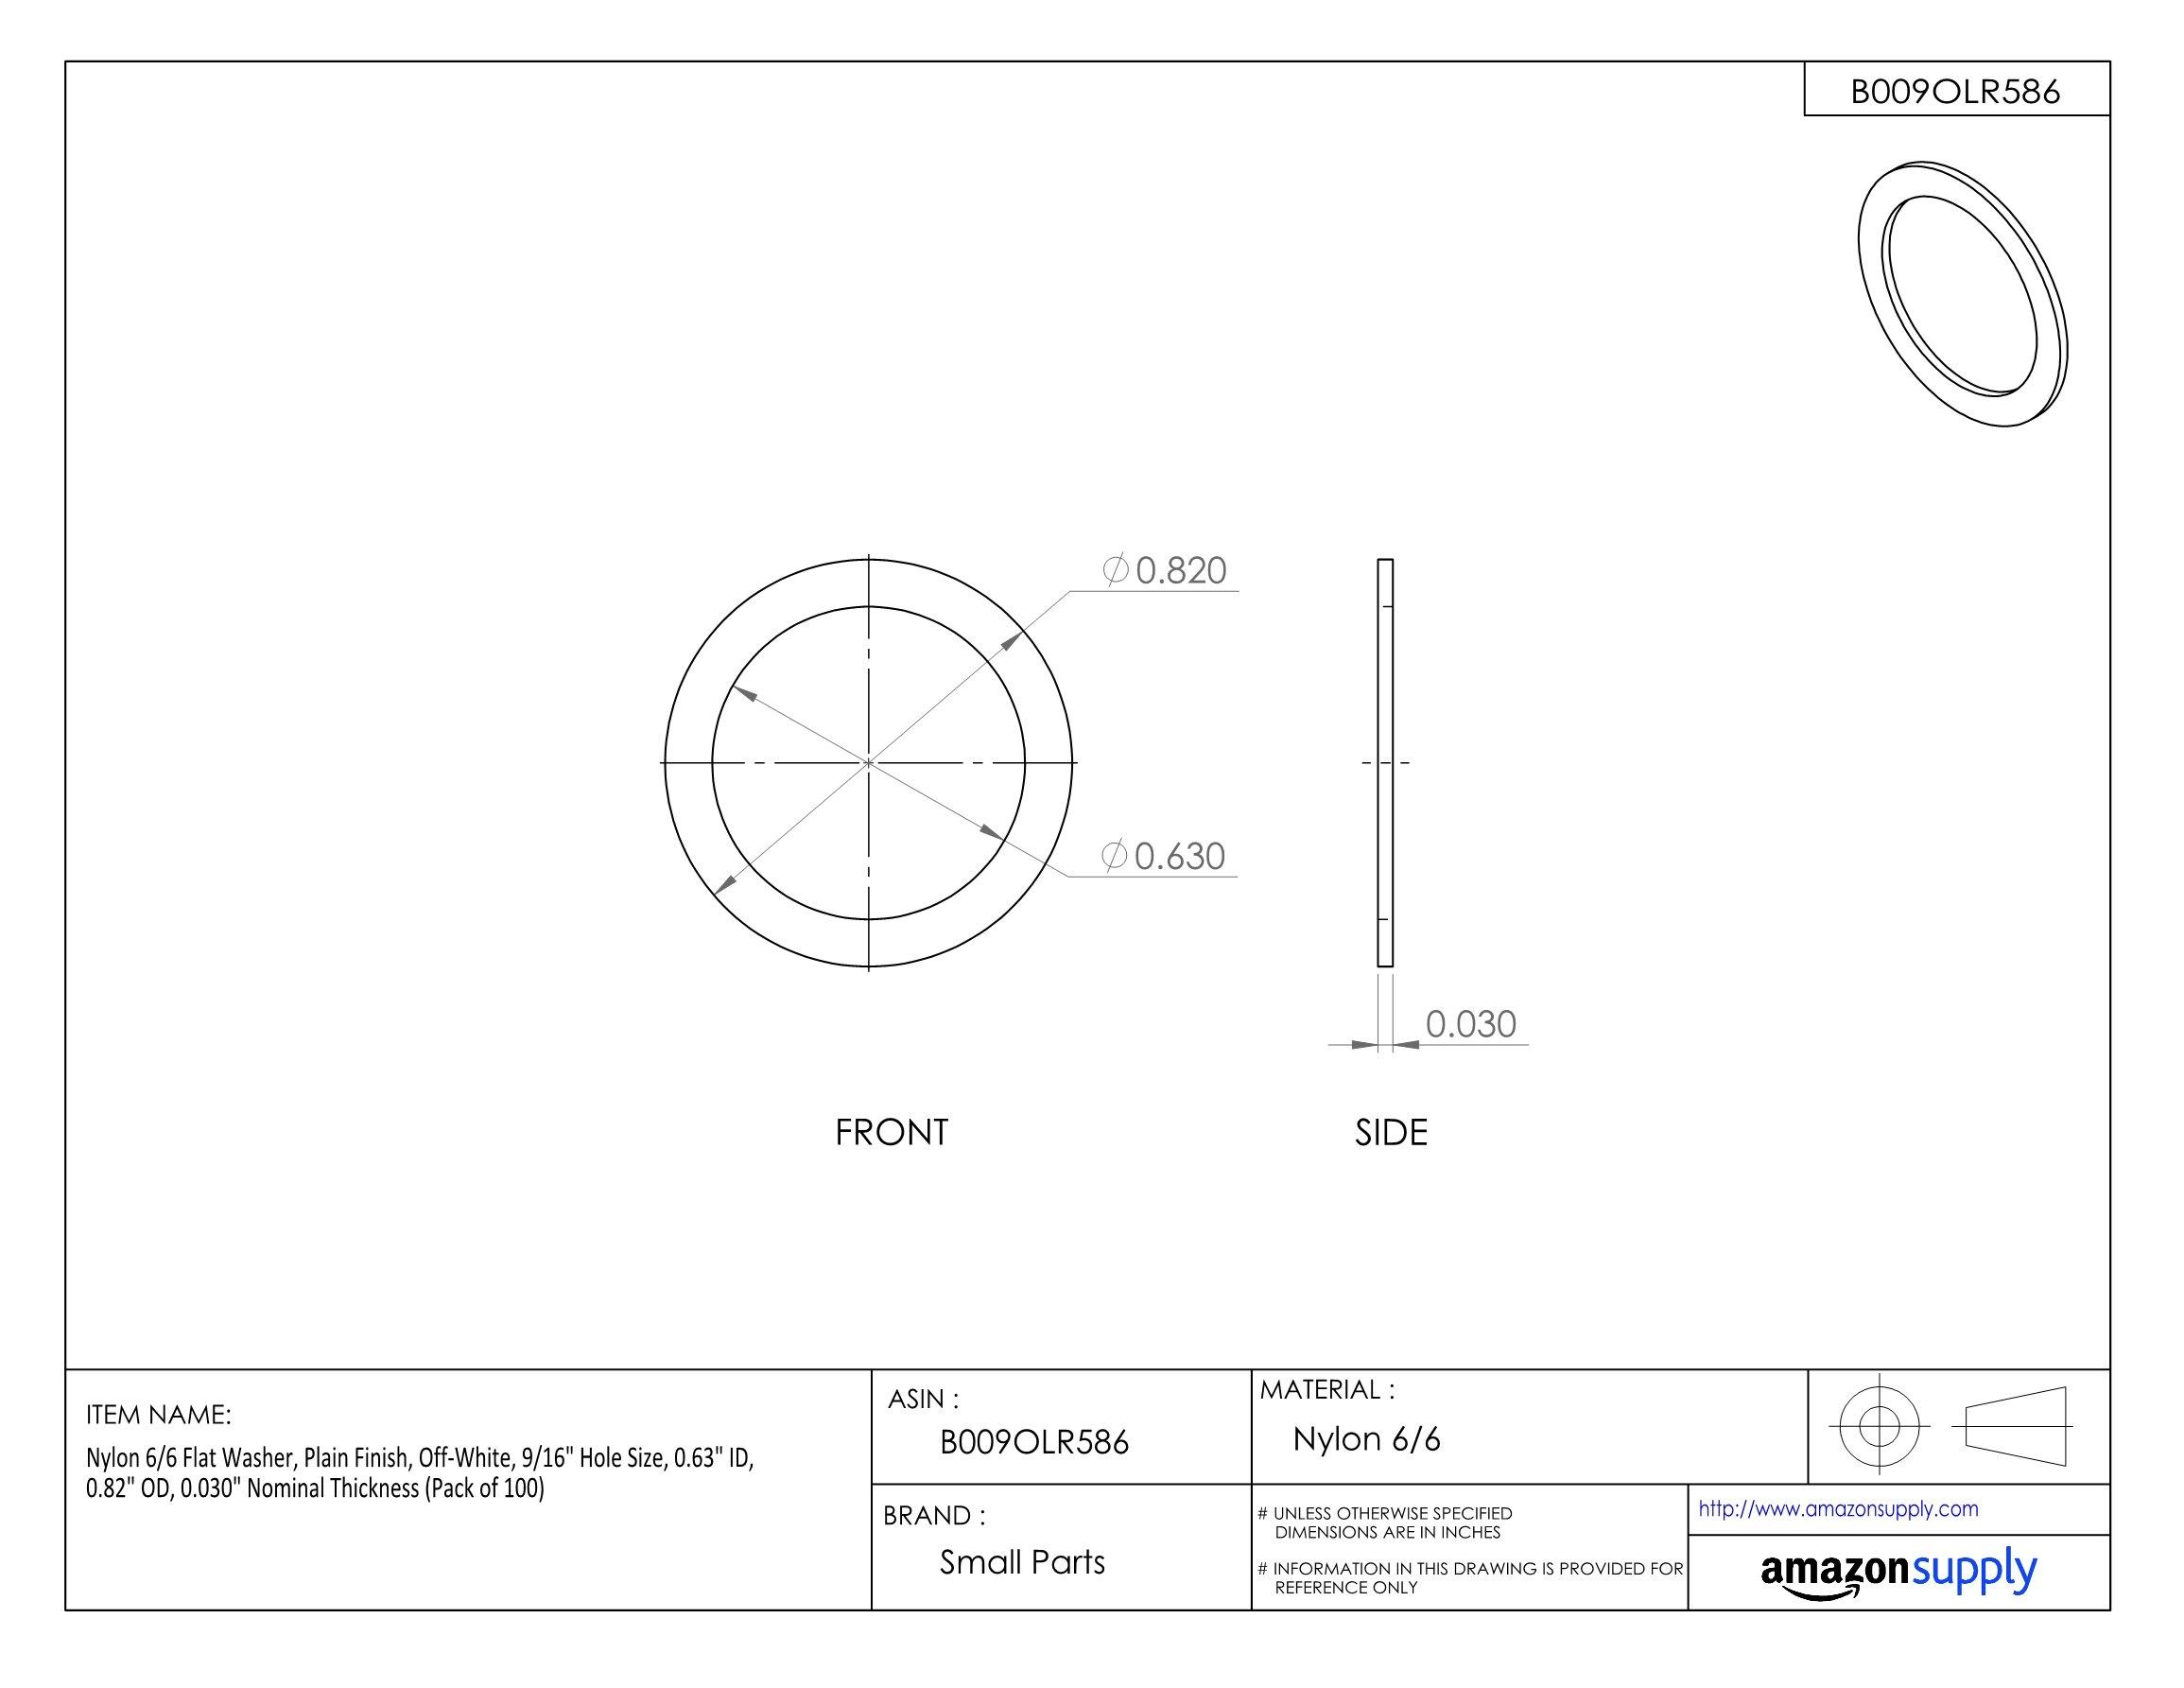 Nylon 6/6 Flat Washer, Plain Finish, Off-White, 9/16'' Hole Size, 0.63'' ID, 0.82'' OD, 0.030'' Nominal Thickness (Pack of 100)